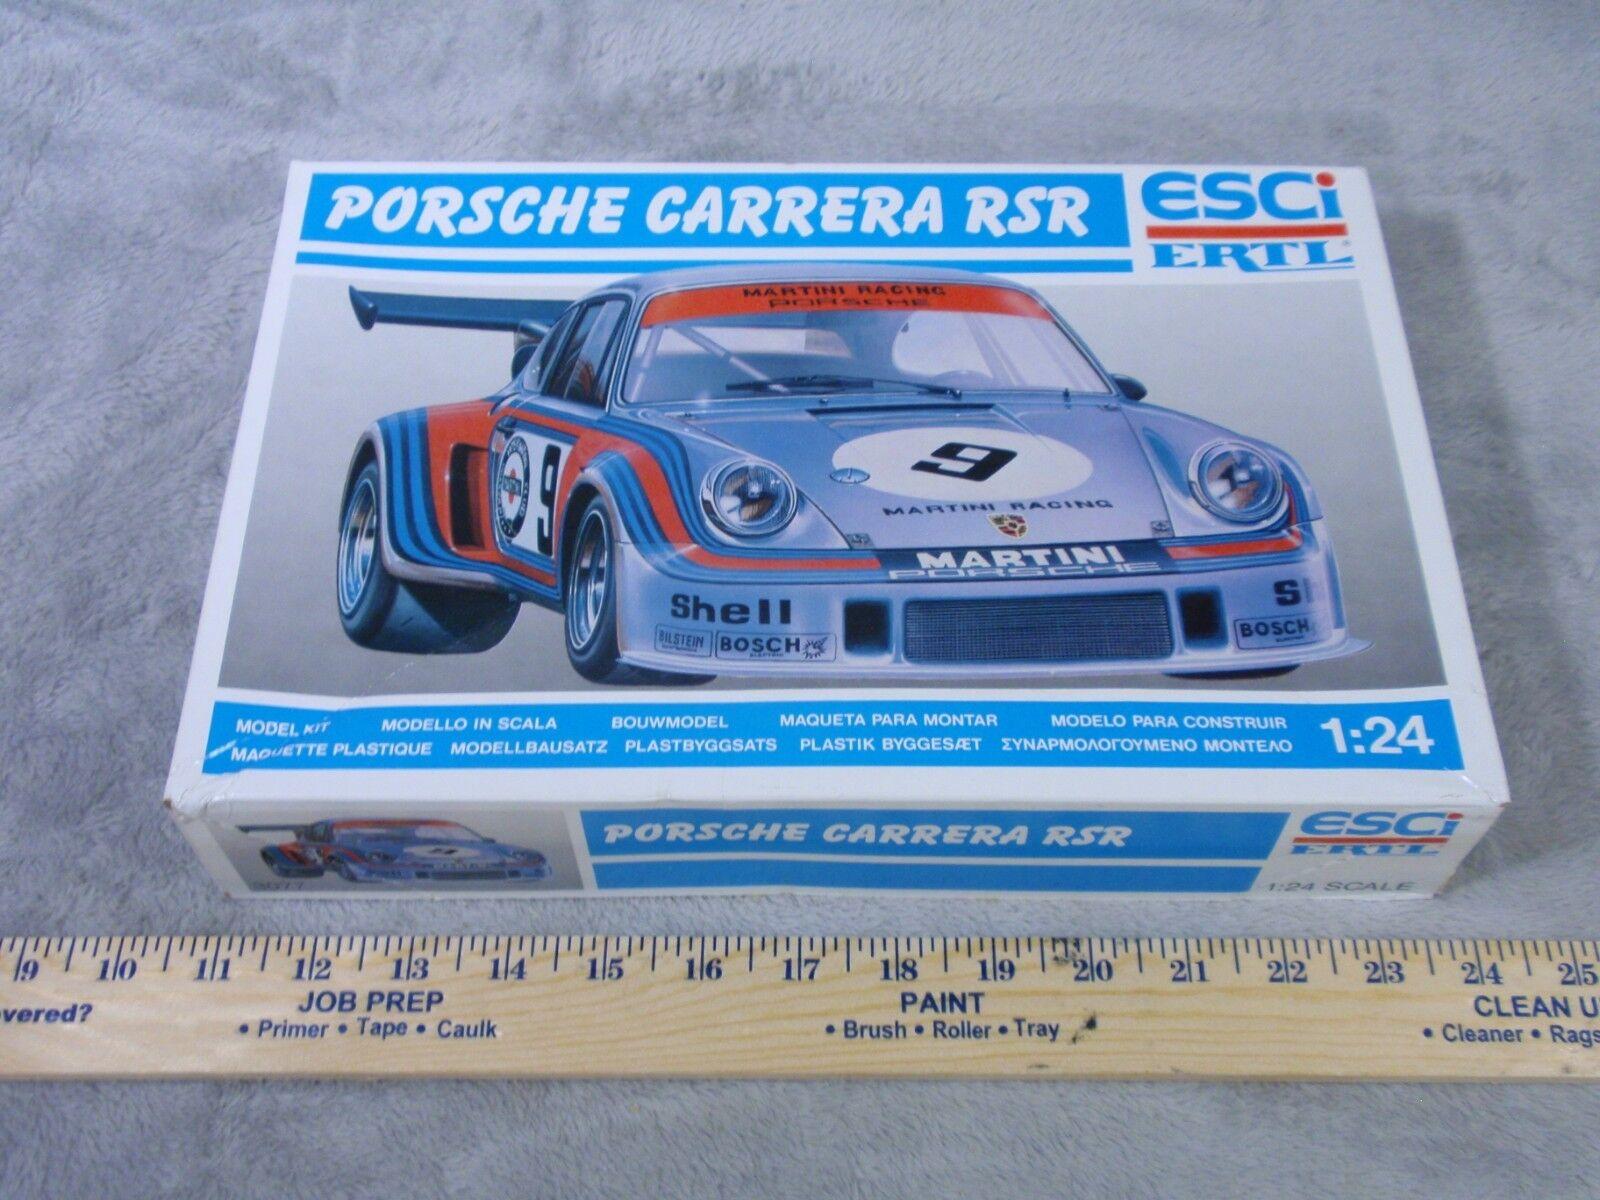 ESCI ERTL Porsche Carrera RSR 1 24 Scale Plastic Model Car Kit Vintage